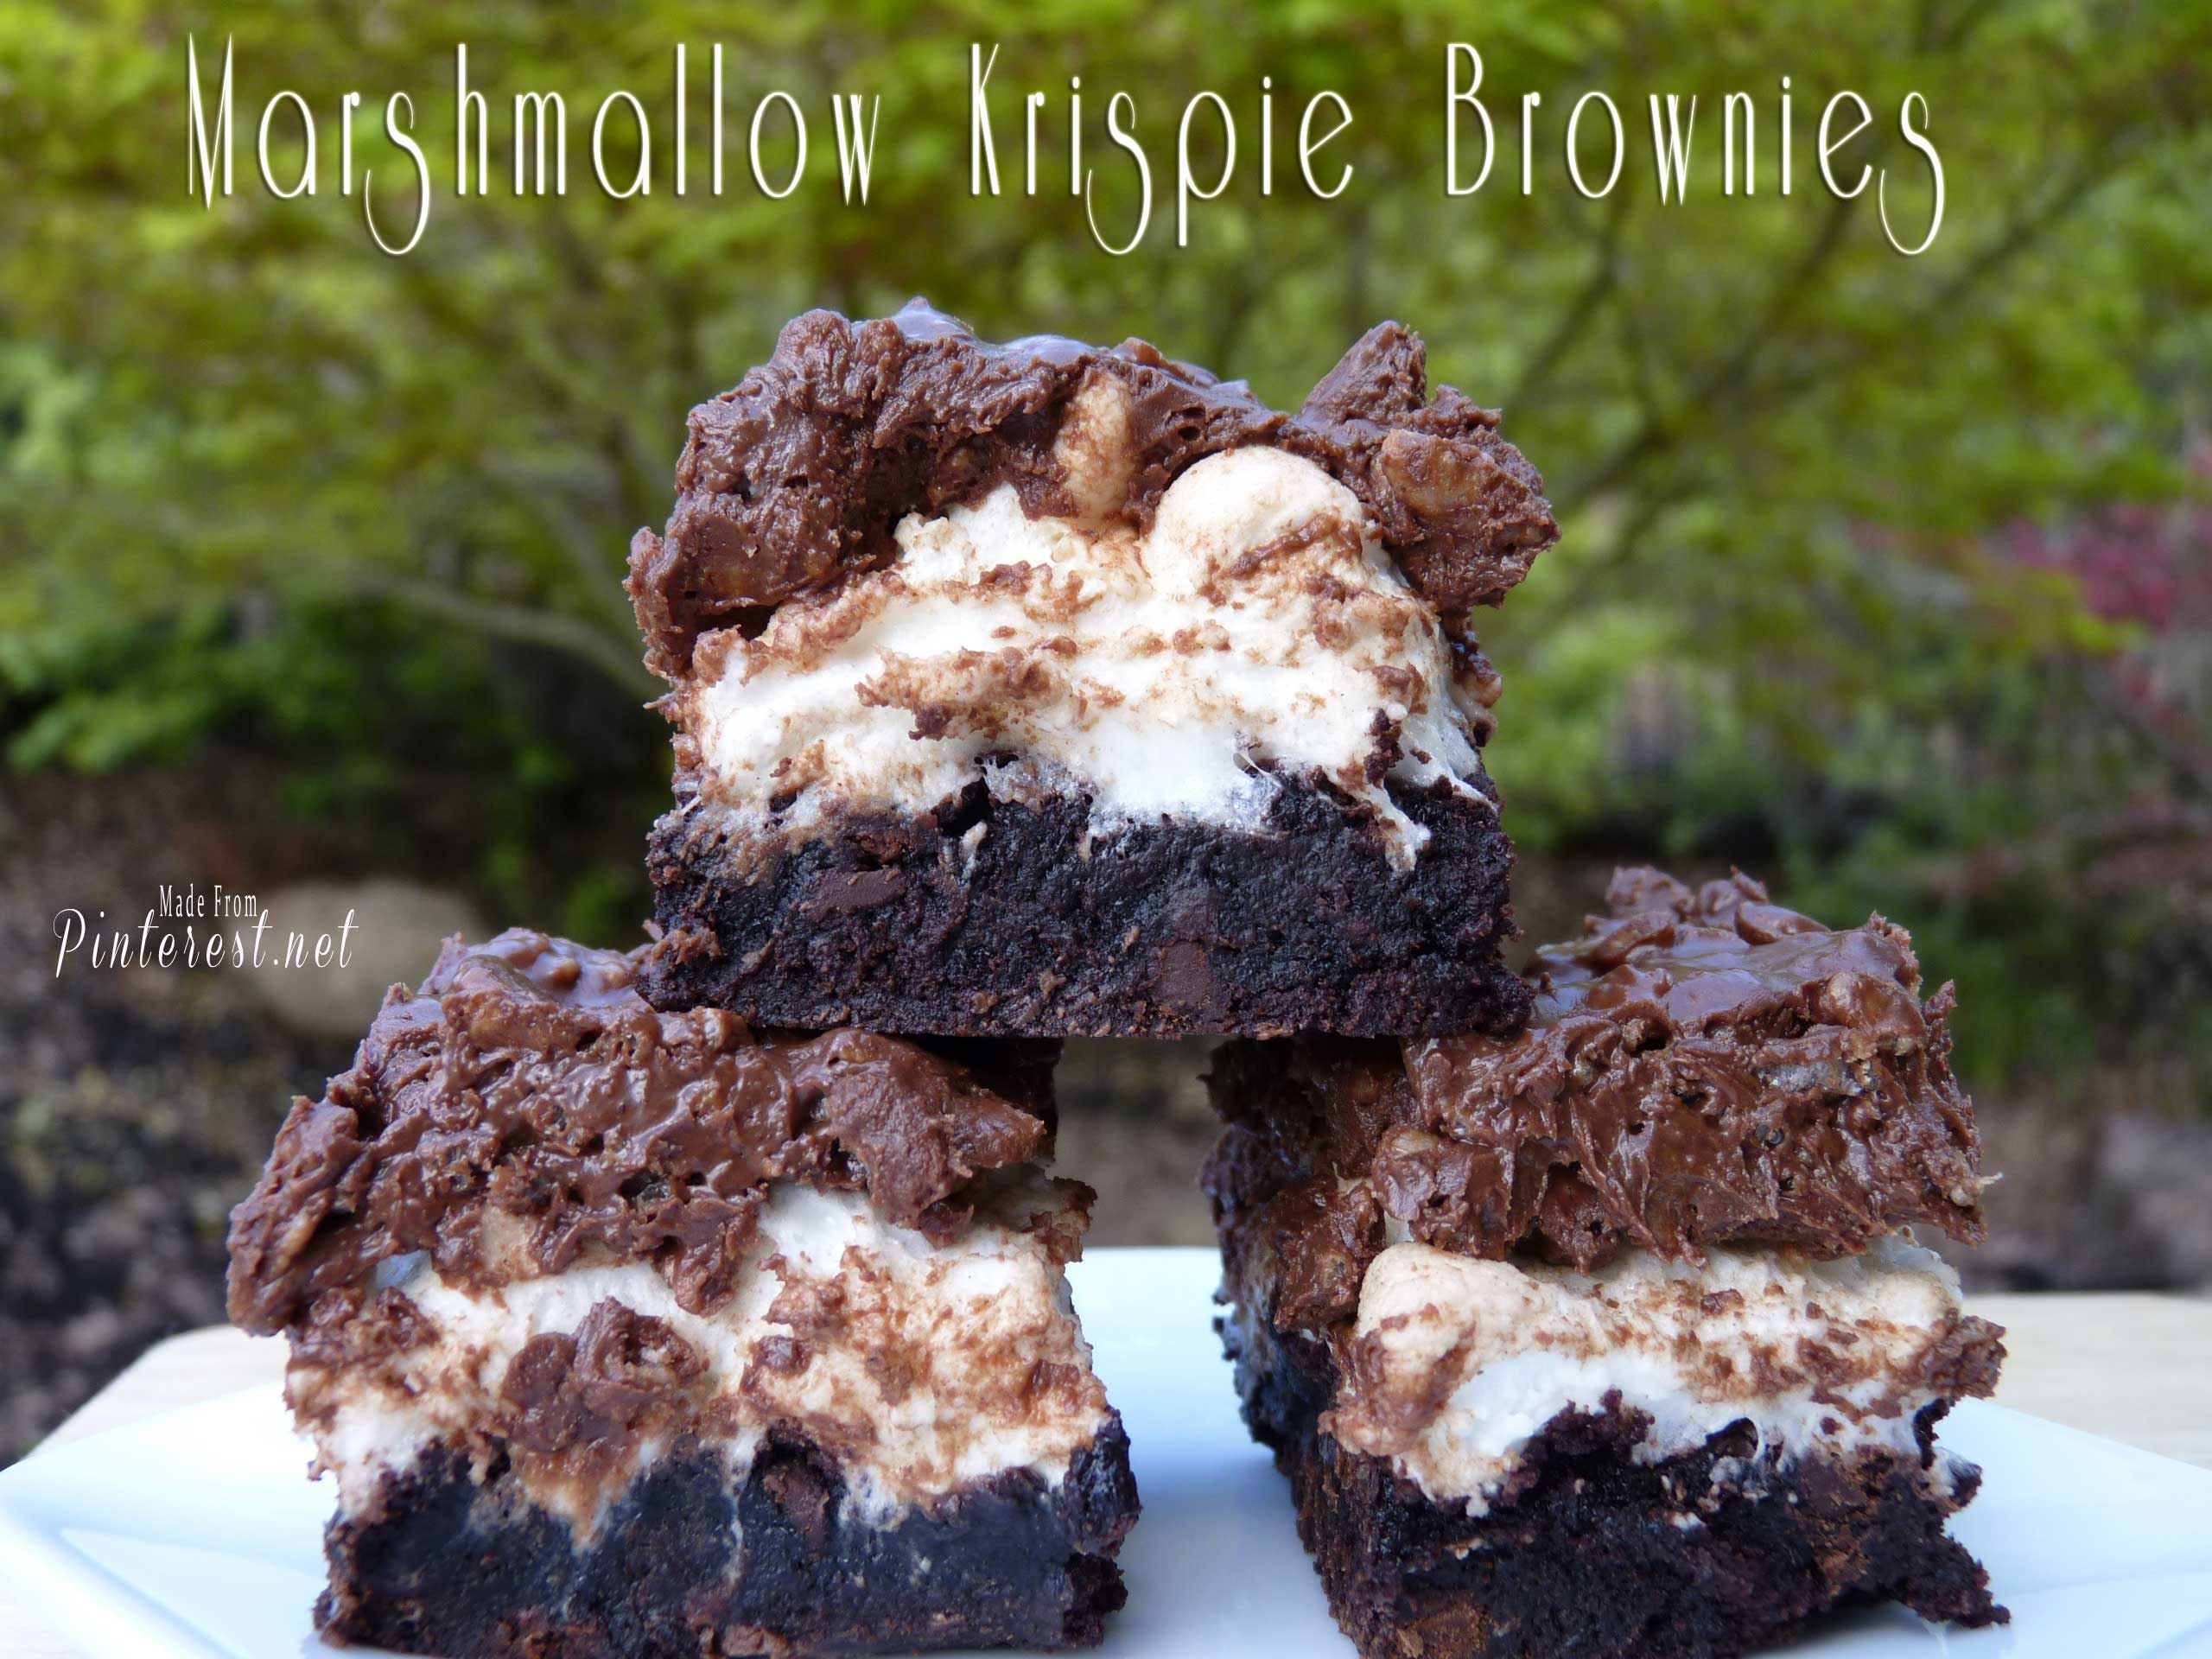 Marshmallow Krispie Brownies - TGIF - This Grandma is Fun